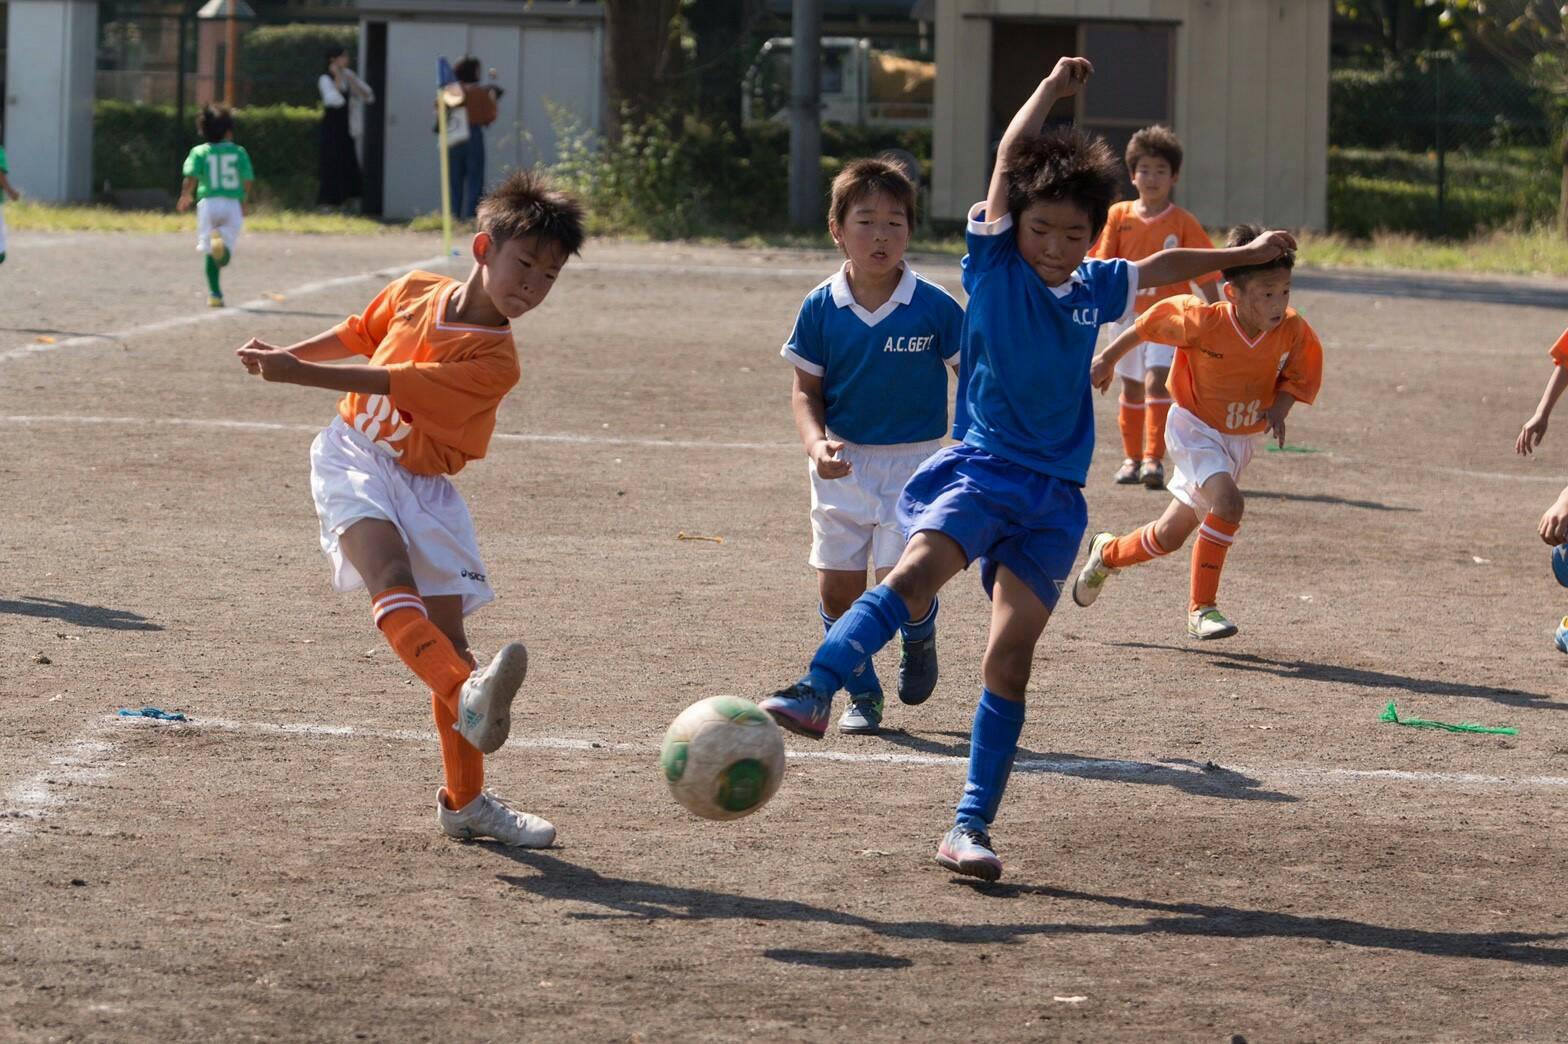 http://www.fc-chouwa.net/blog/images/%E2%98%85IMG_2146.JPG